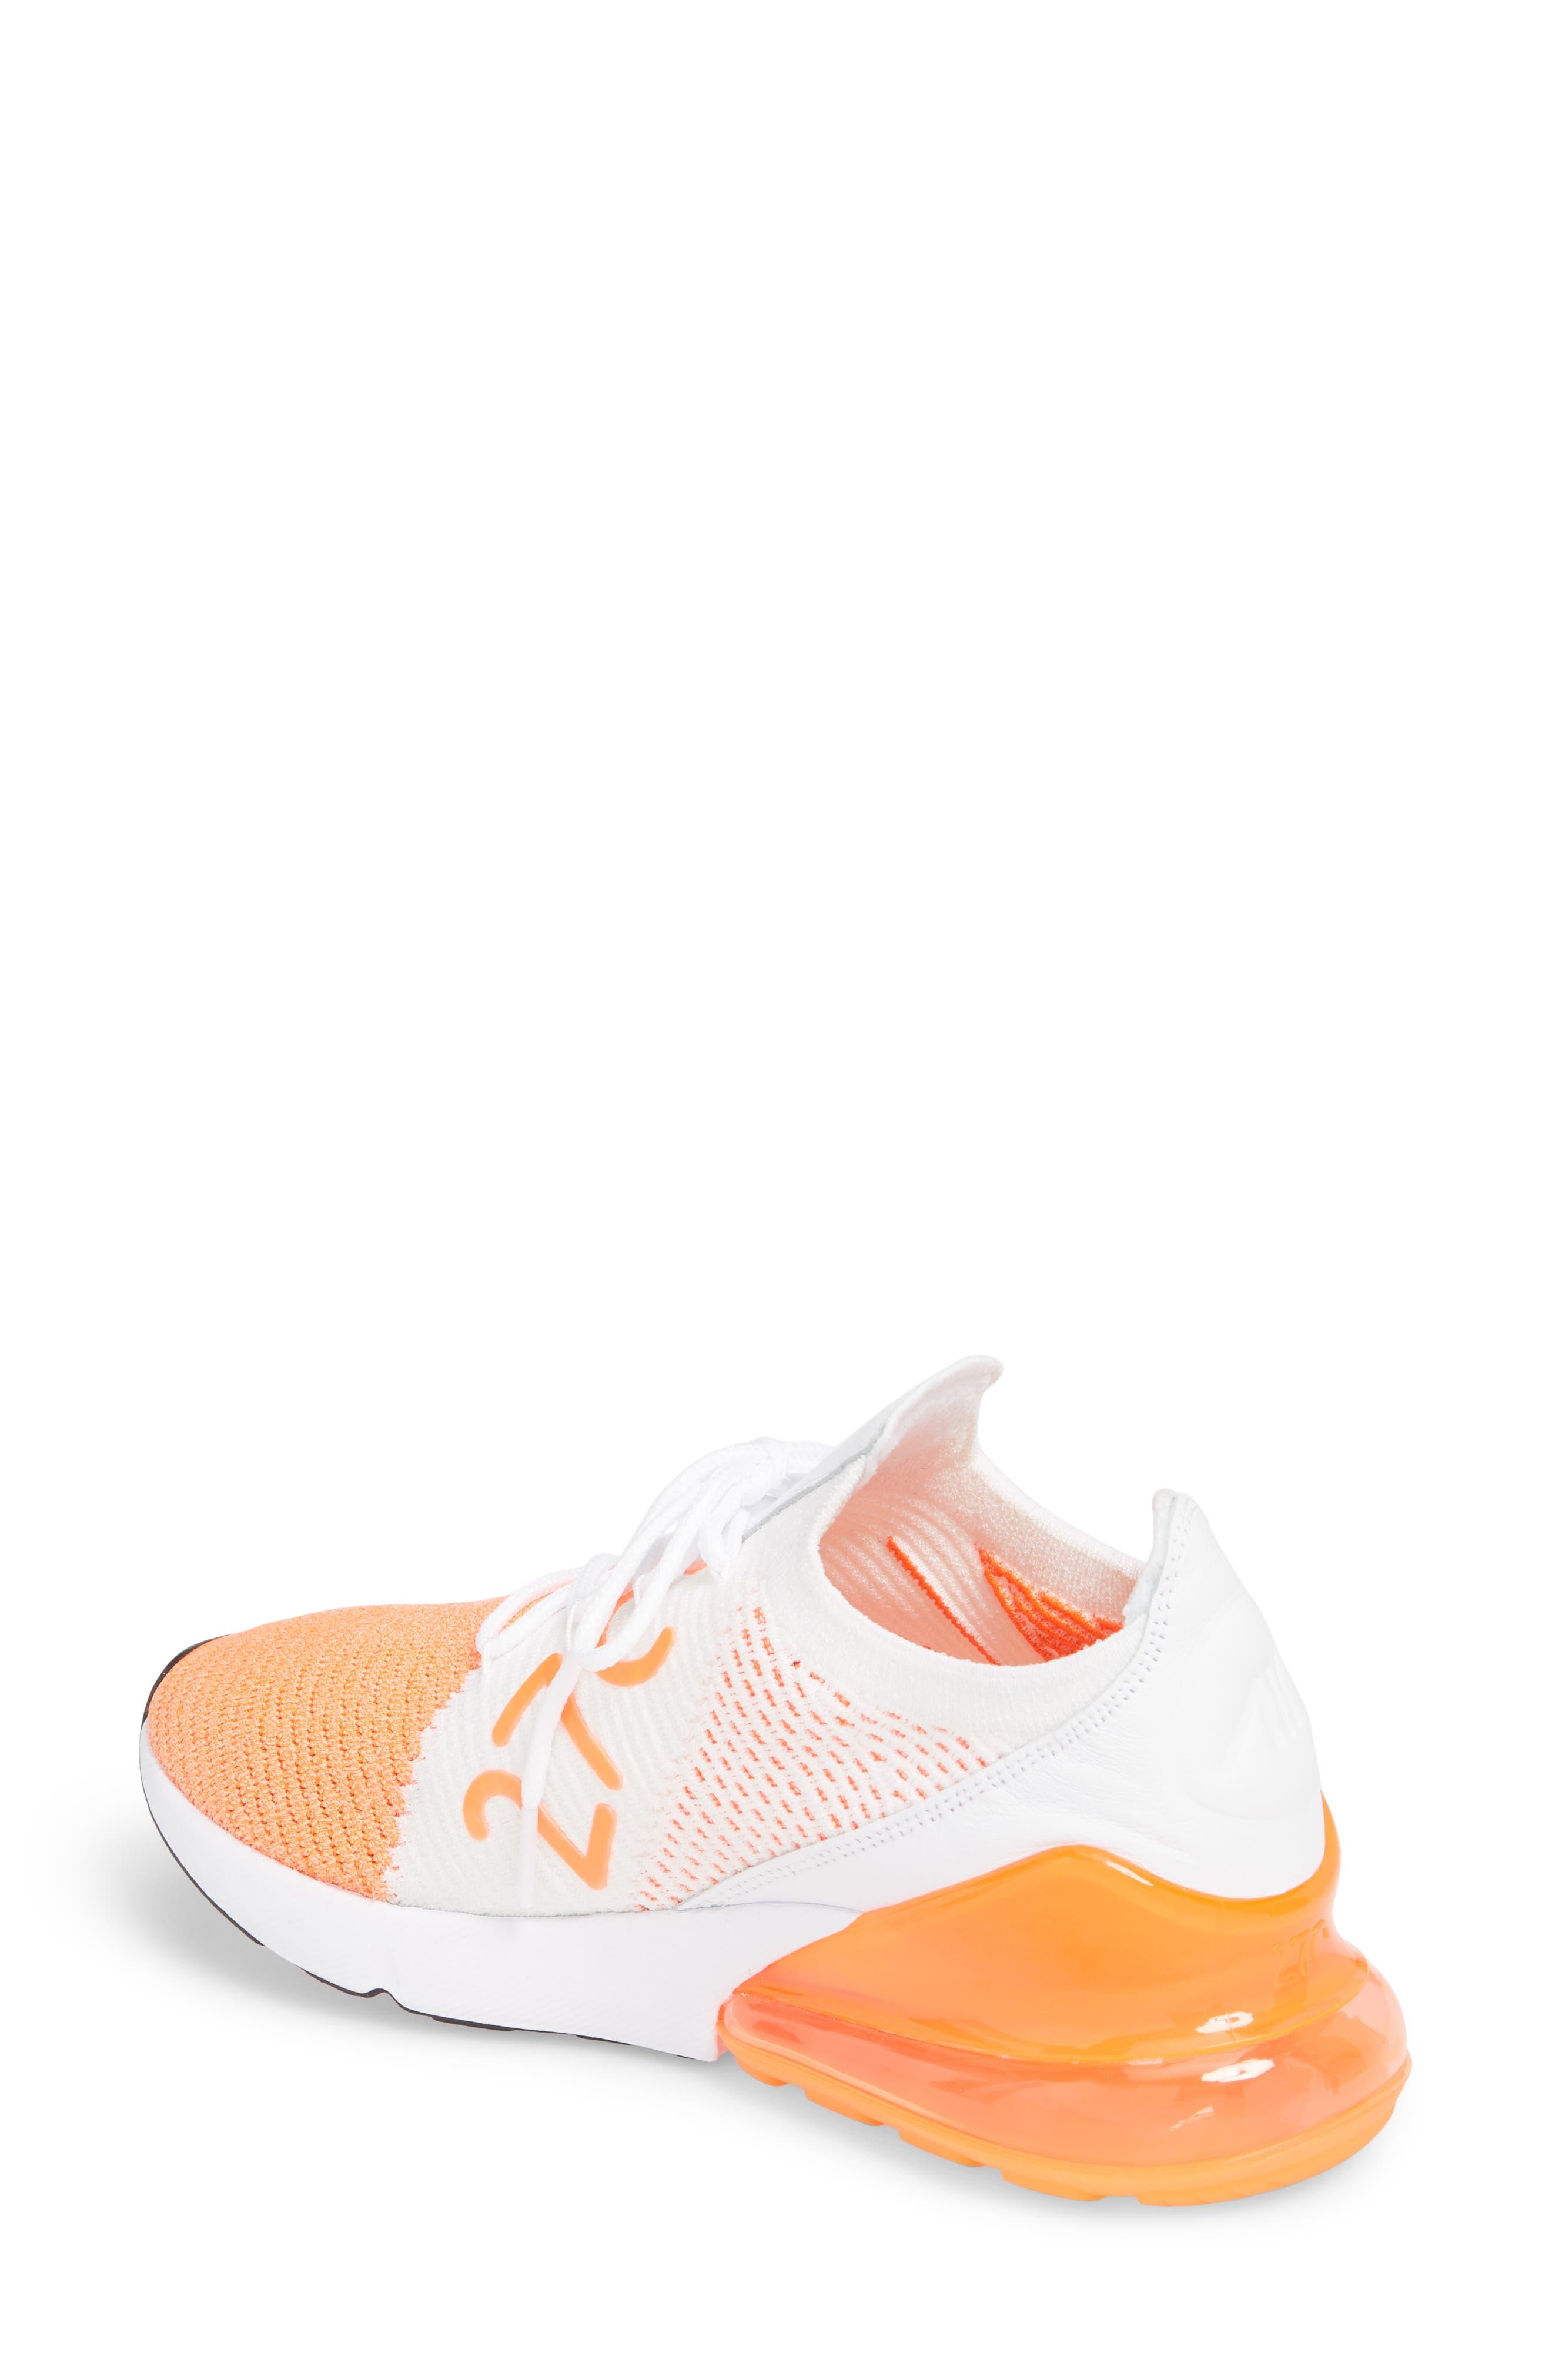 Air Max 270 Flyknit Sneaker,                             Alternate thumbnail 15, color,